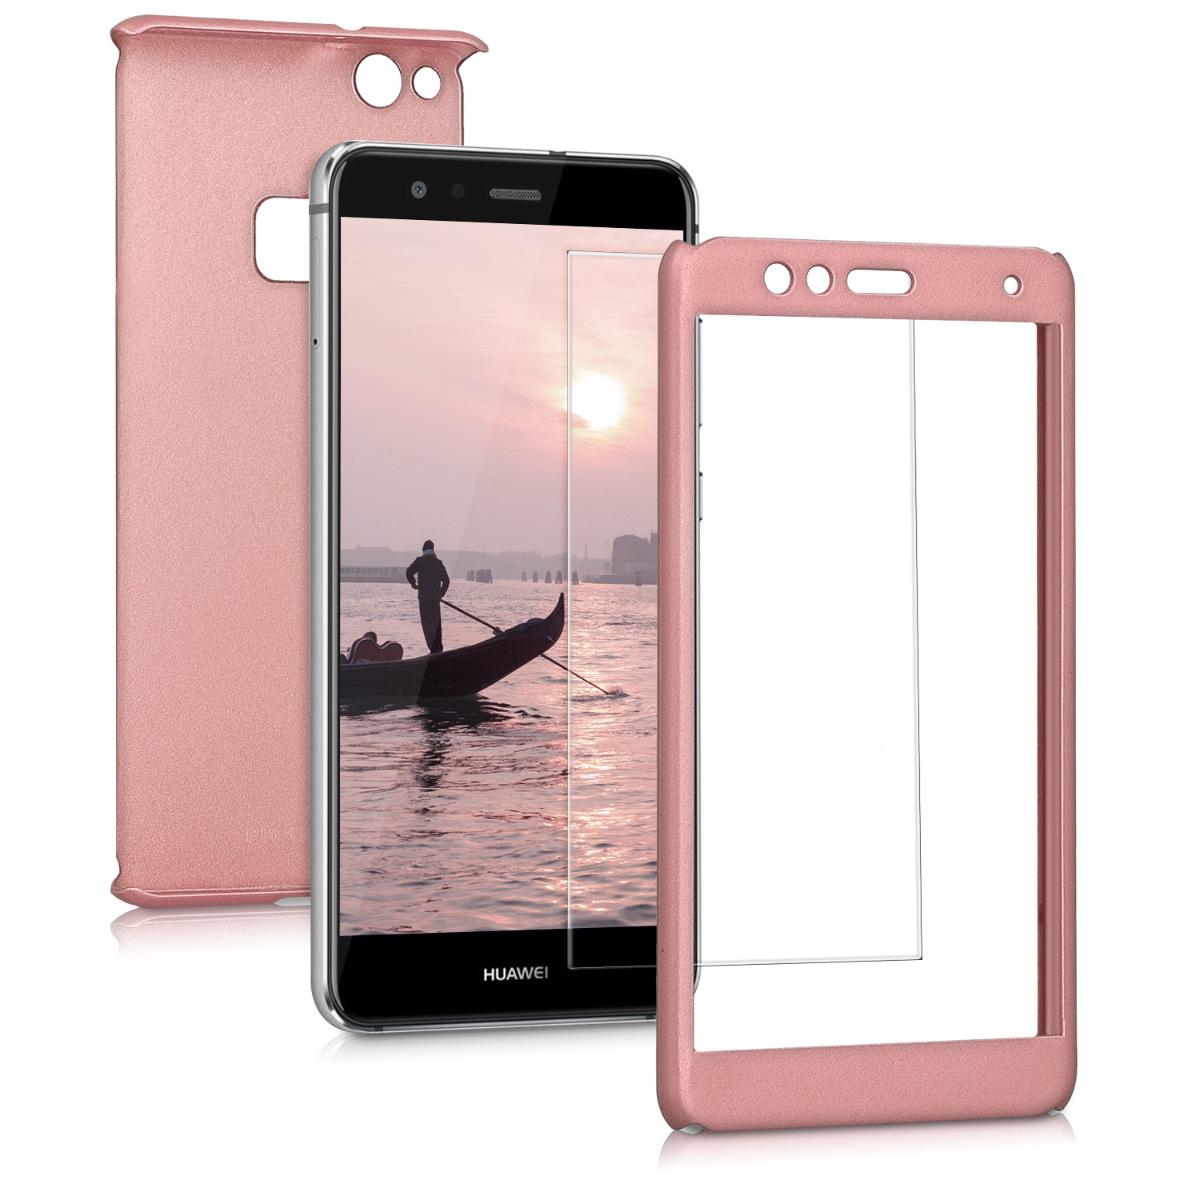 KW Θήκη Full Body Huawei P10 Lite & Tempered Glass - Metallic Rose Gold (43763.31)